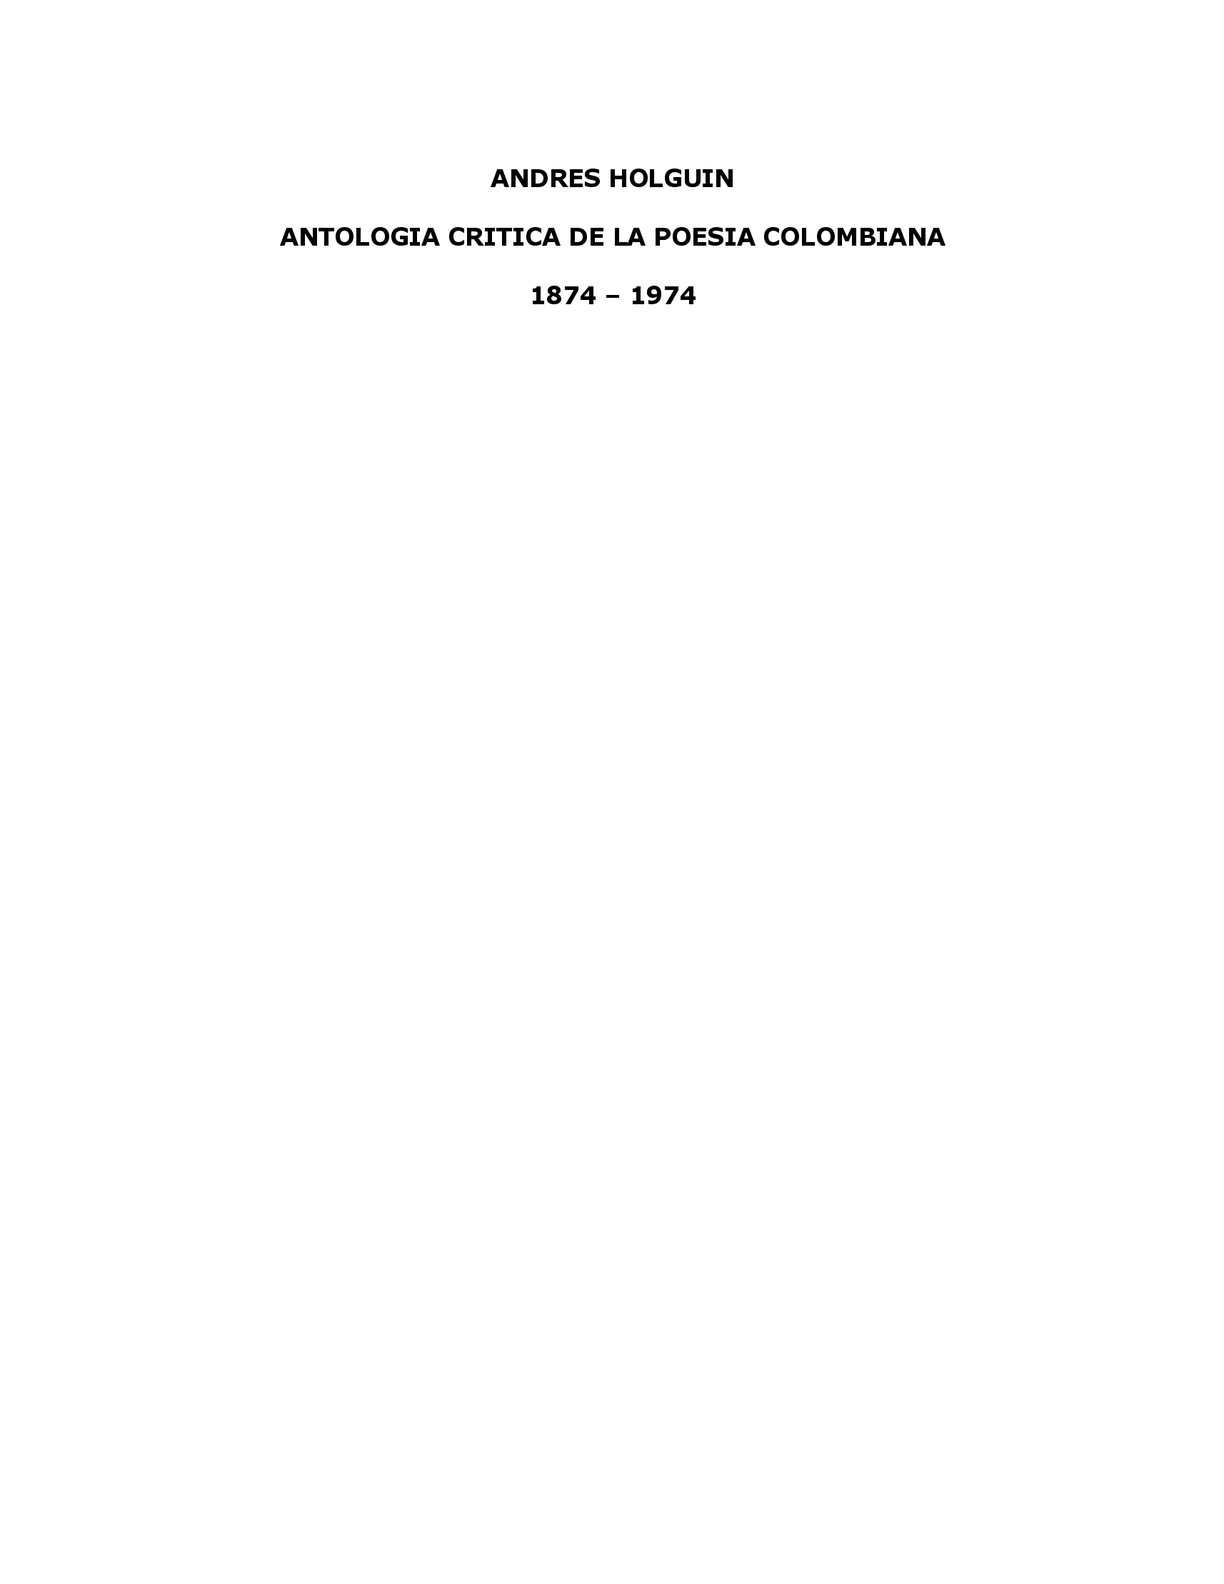 Calaméo - Holguín, Andrés-Antologia critica de la poesia colombiana